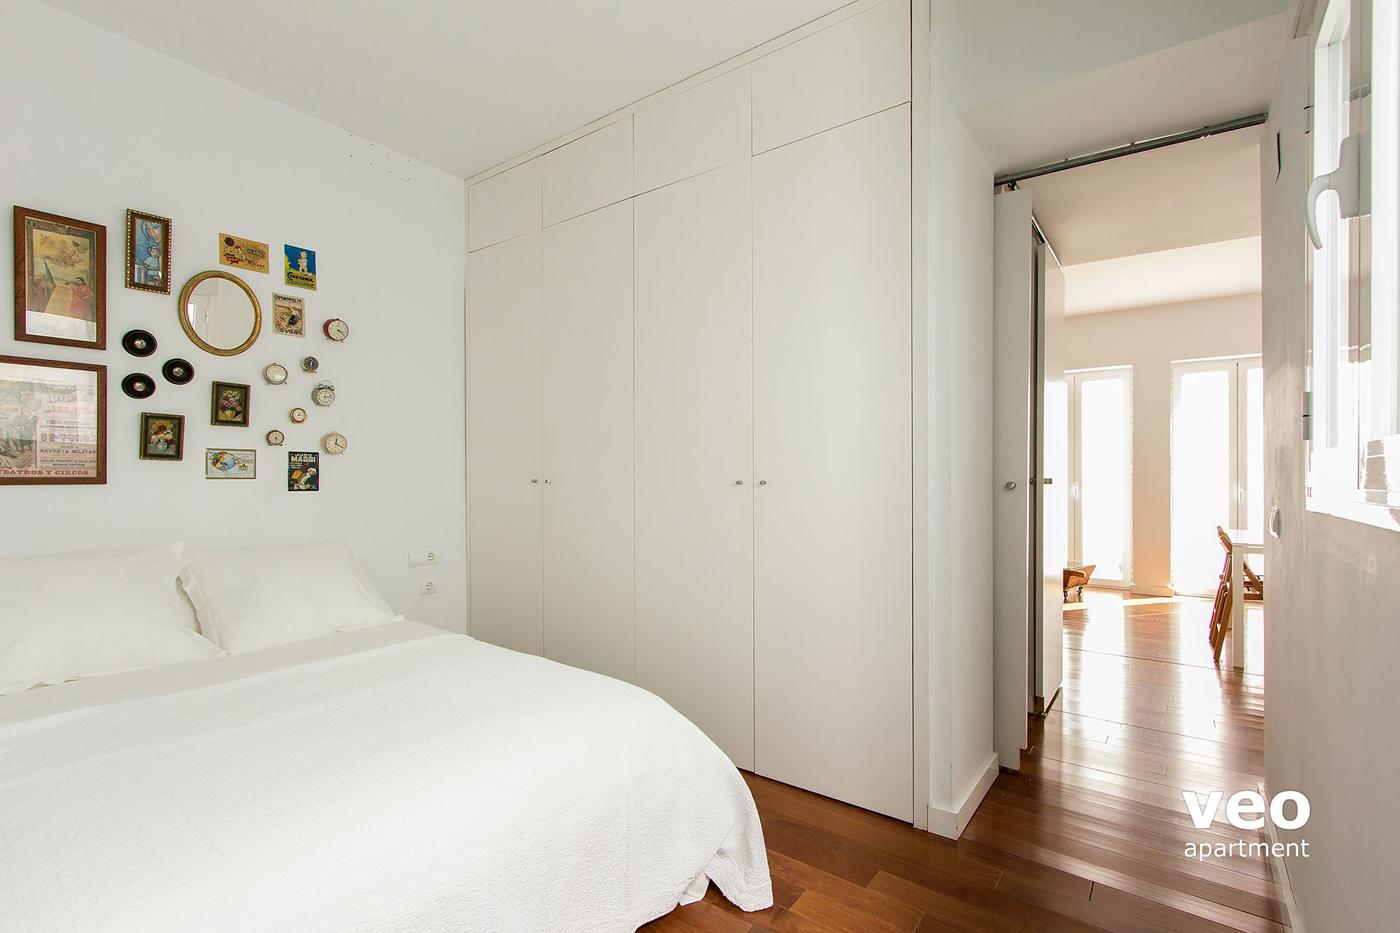 Reforma de apartamento 40 m2 06